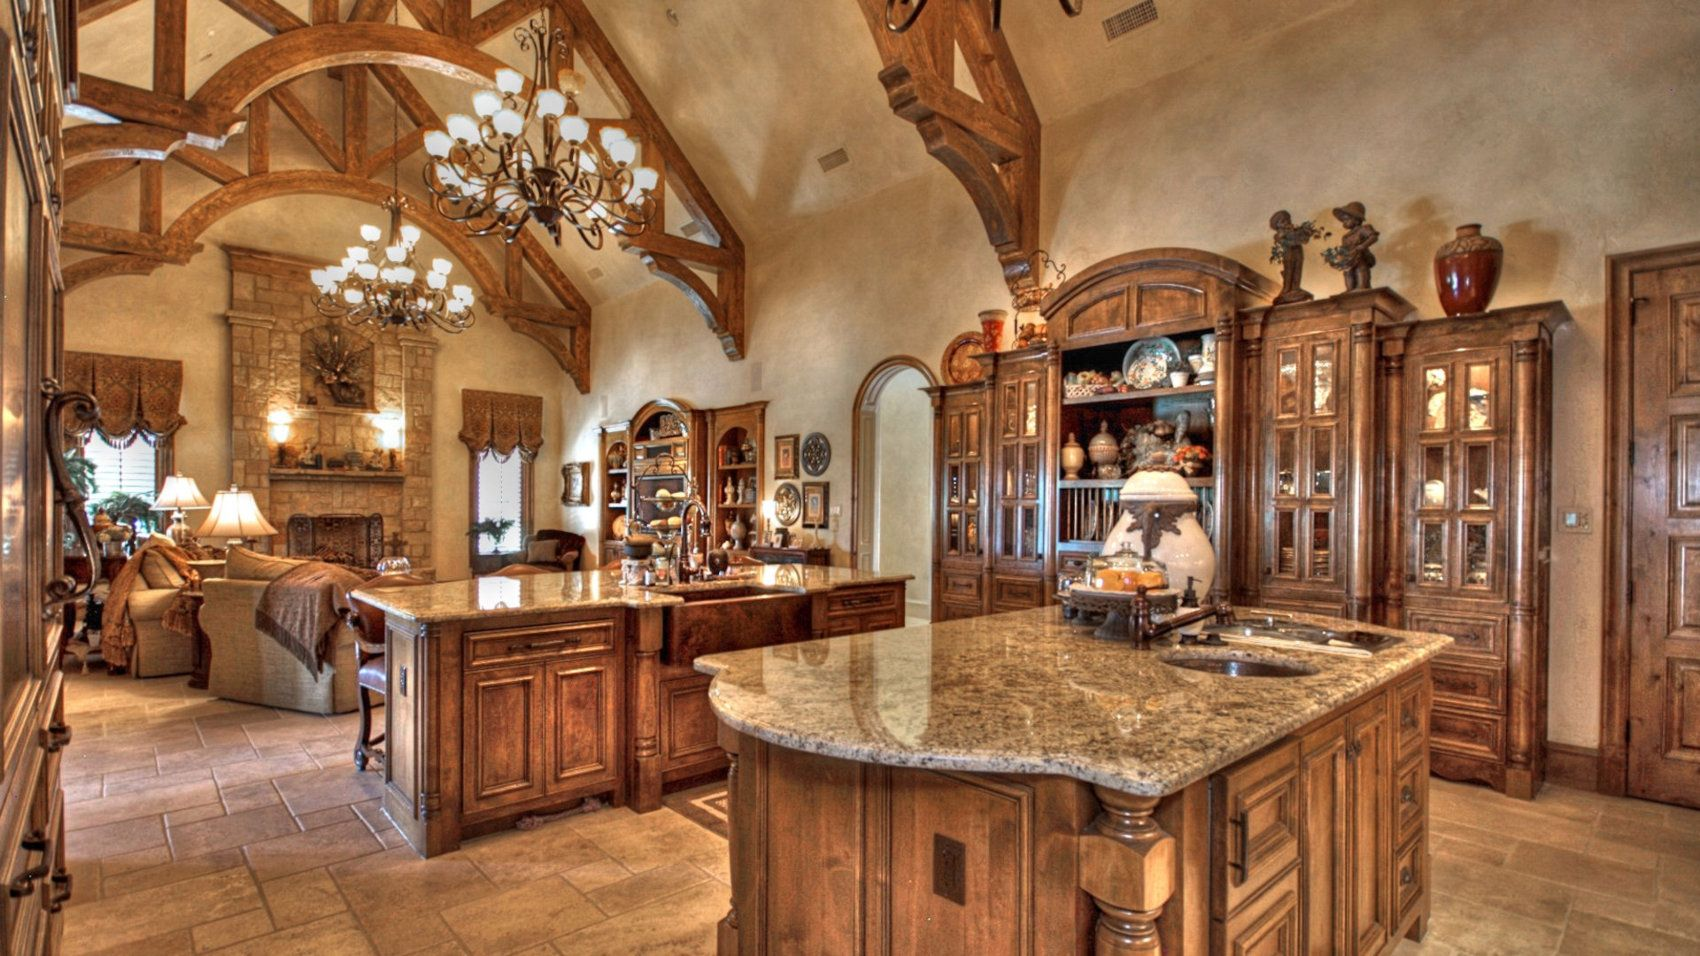 Kitchen Design Adorable Castle With Big